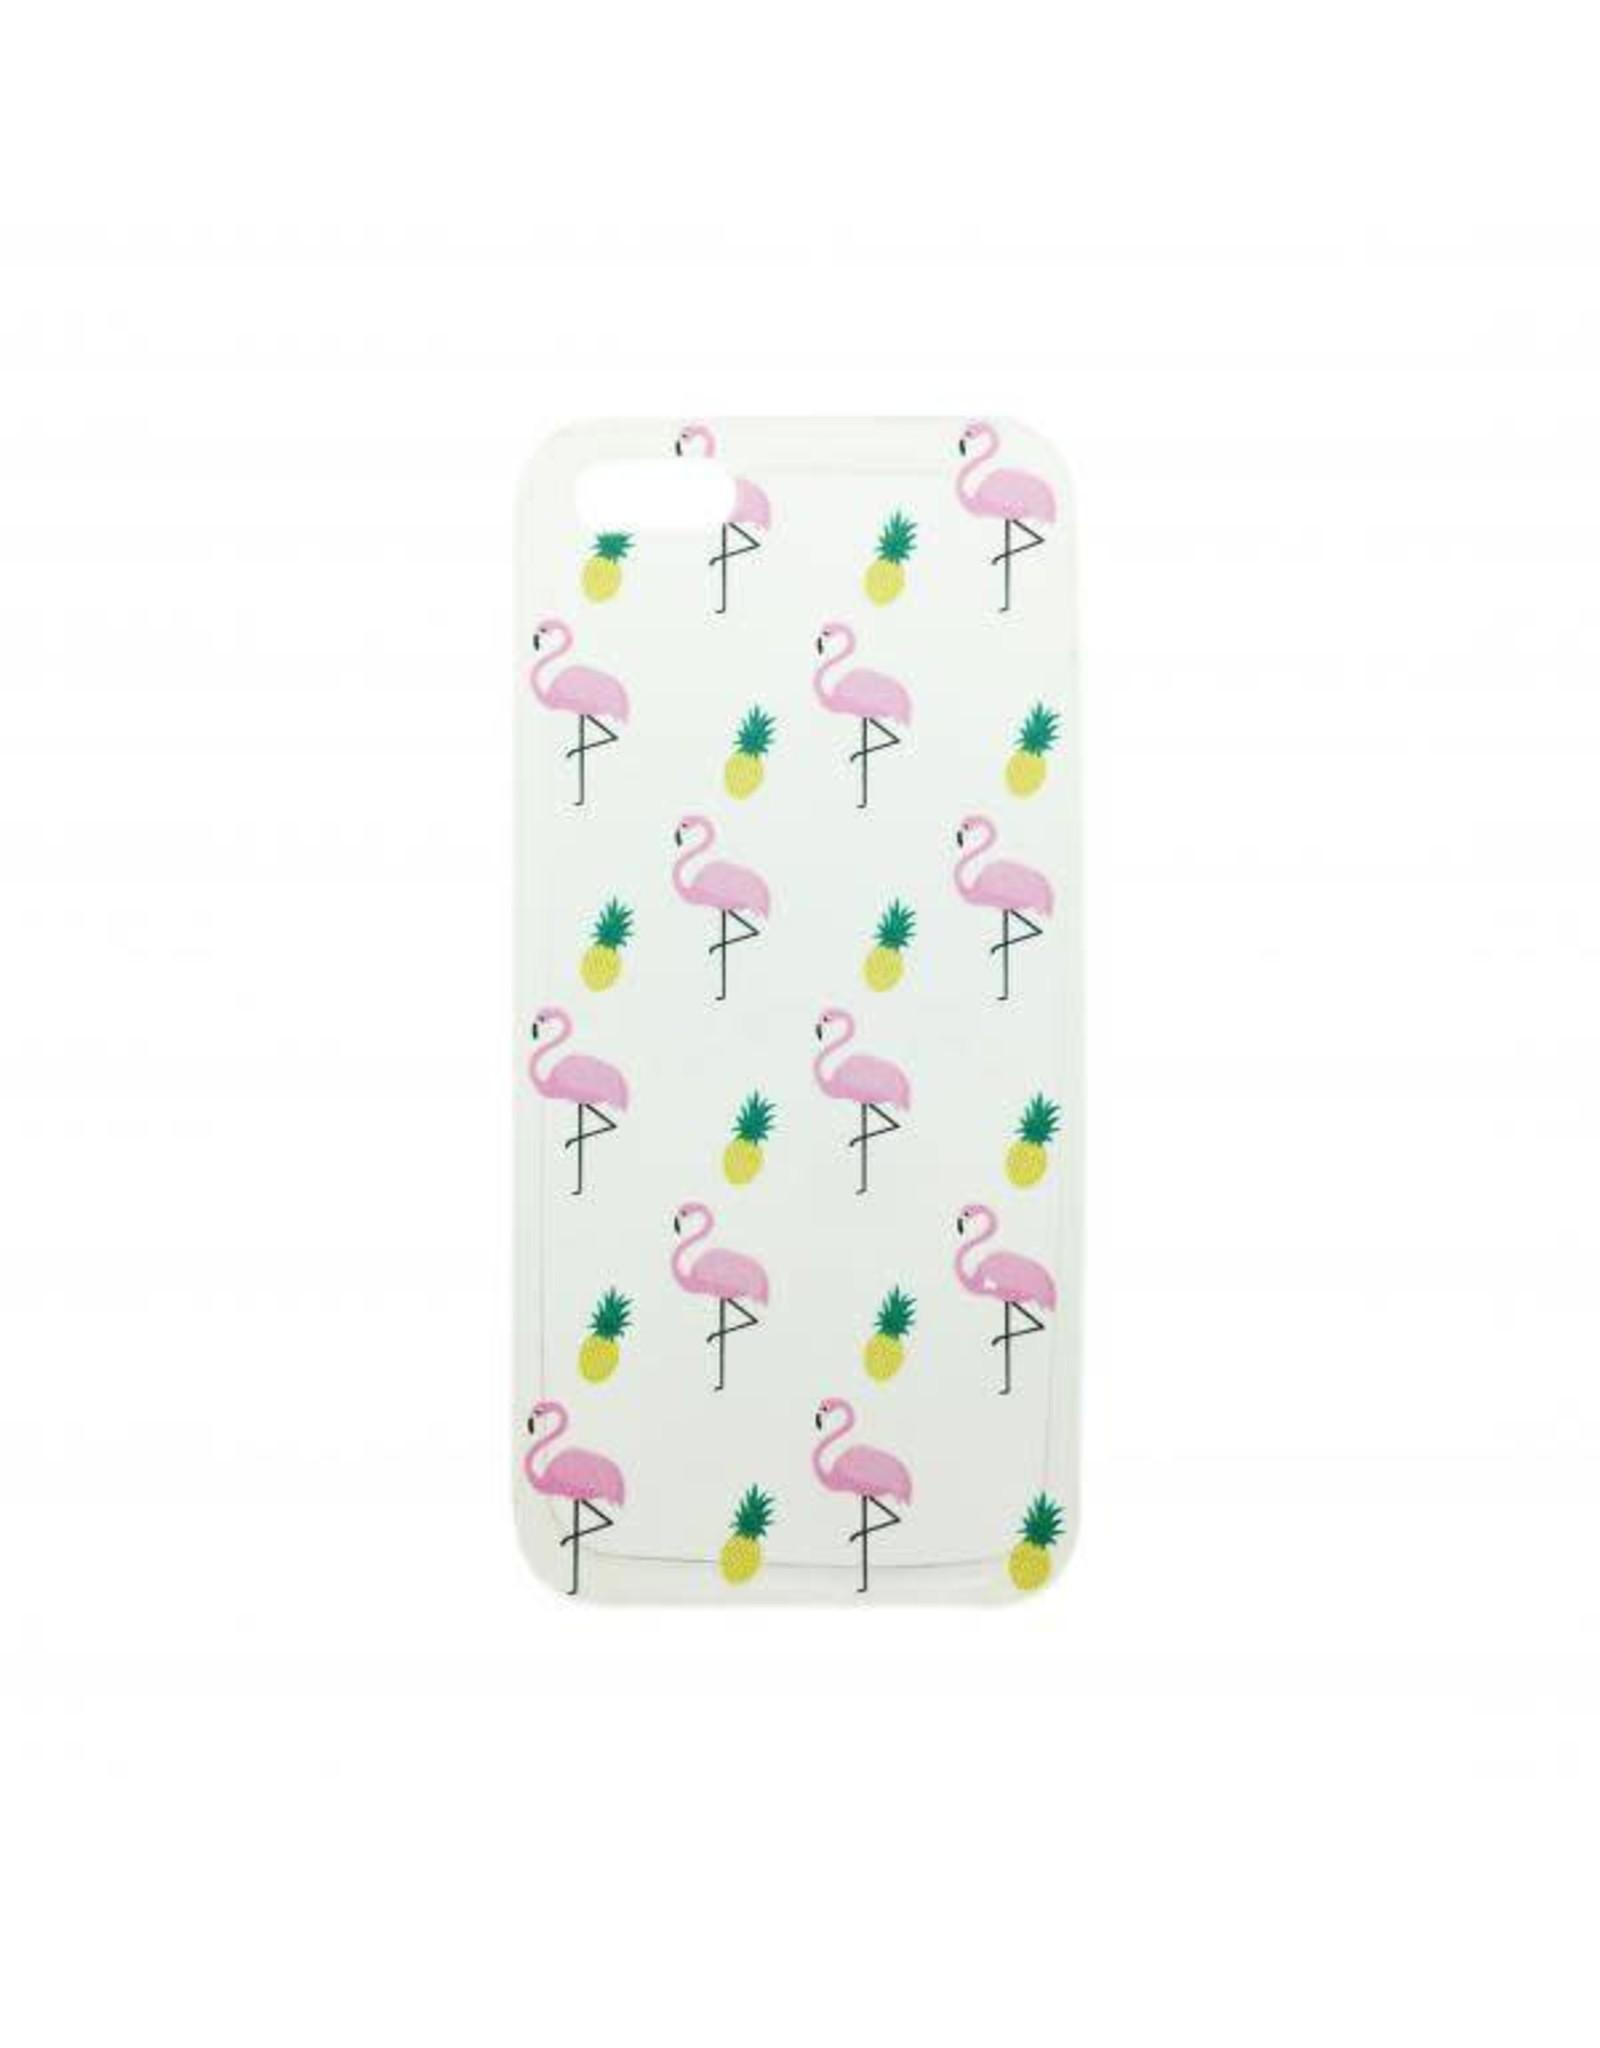 Hoesje iPhone flamingo 7+